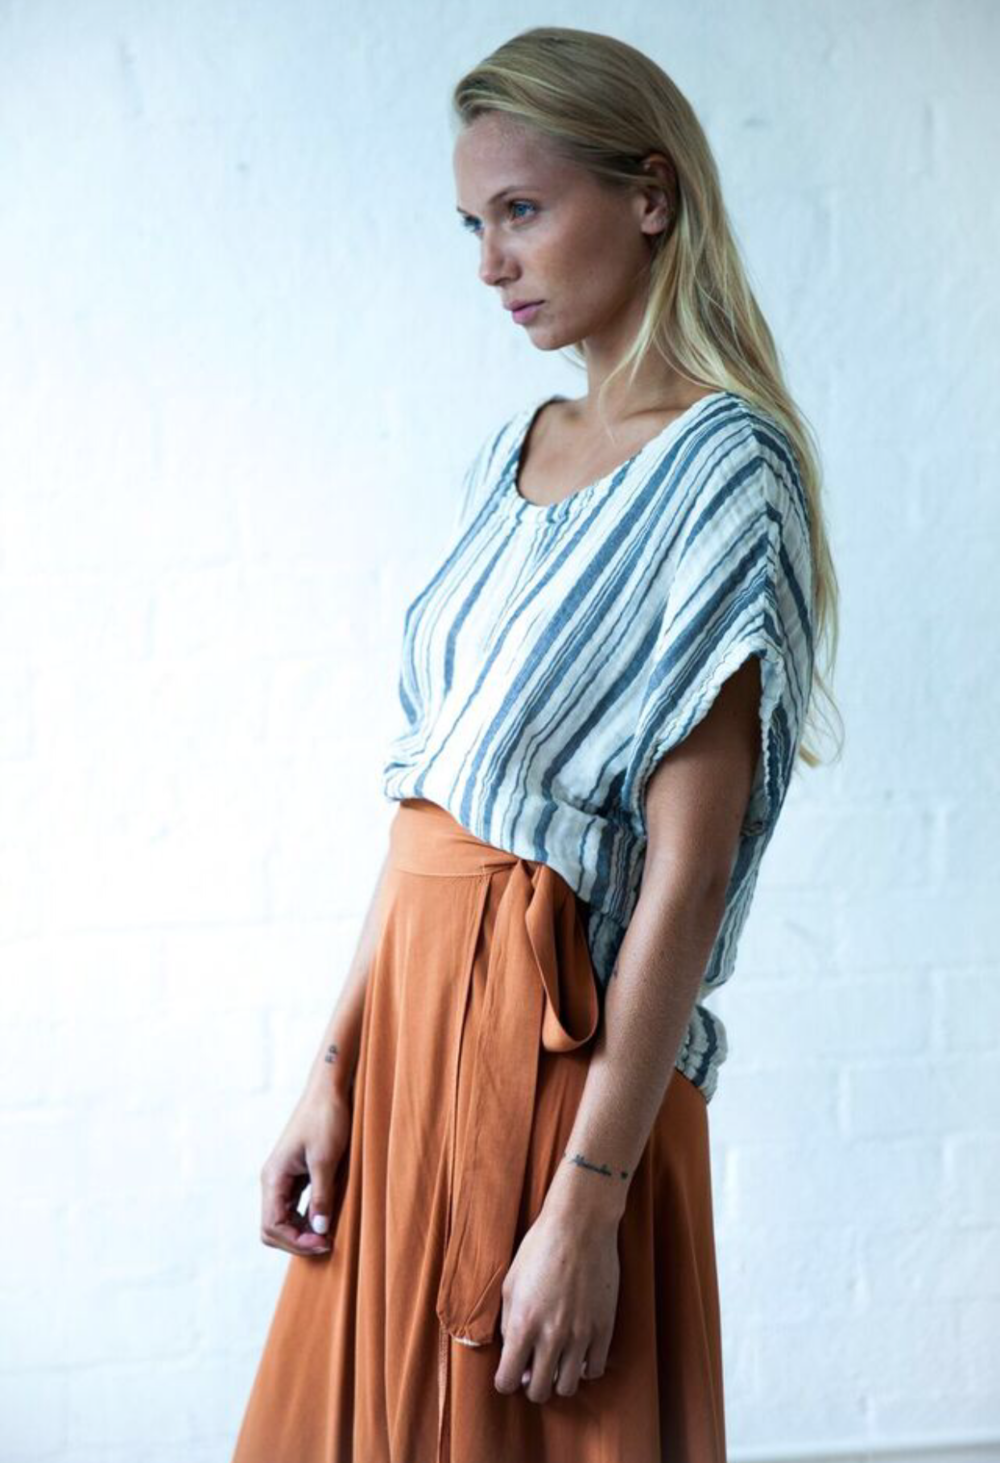 Leor designs clothing.